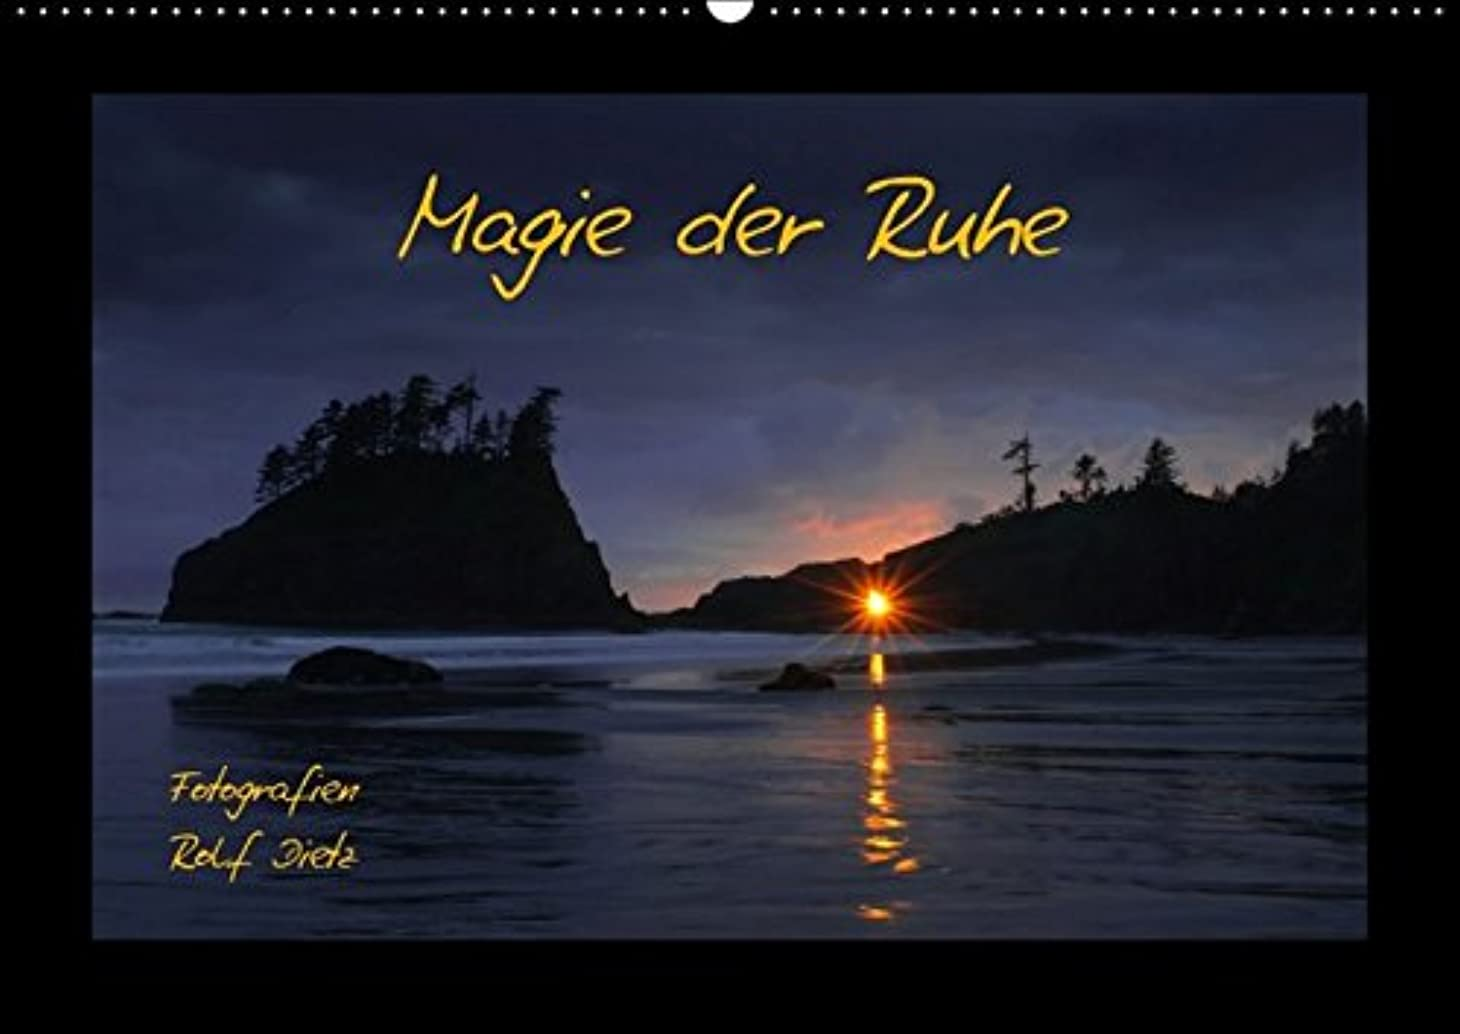 散歩に行く治療燃やすMagie der Ruhe Fotografien Rolf Dietz (Wandkalender immerwaehrend DIN A2 quer): Ein Kalender der mit einzigartigen Bildern zur Besinnlichkeit anregt. (Monatskalender, 14 Seiten)